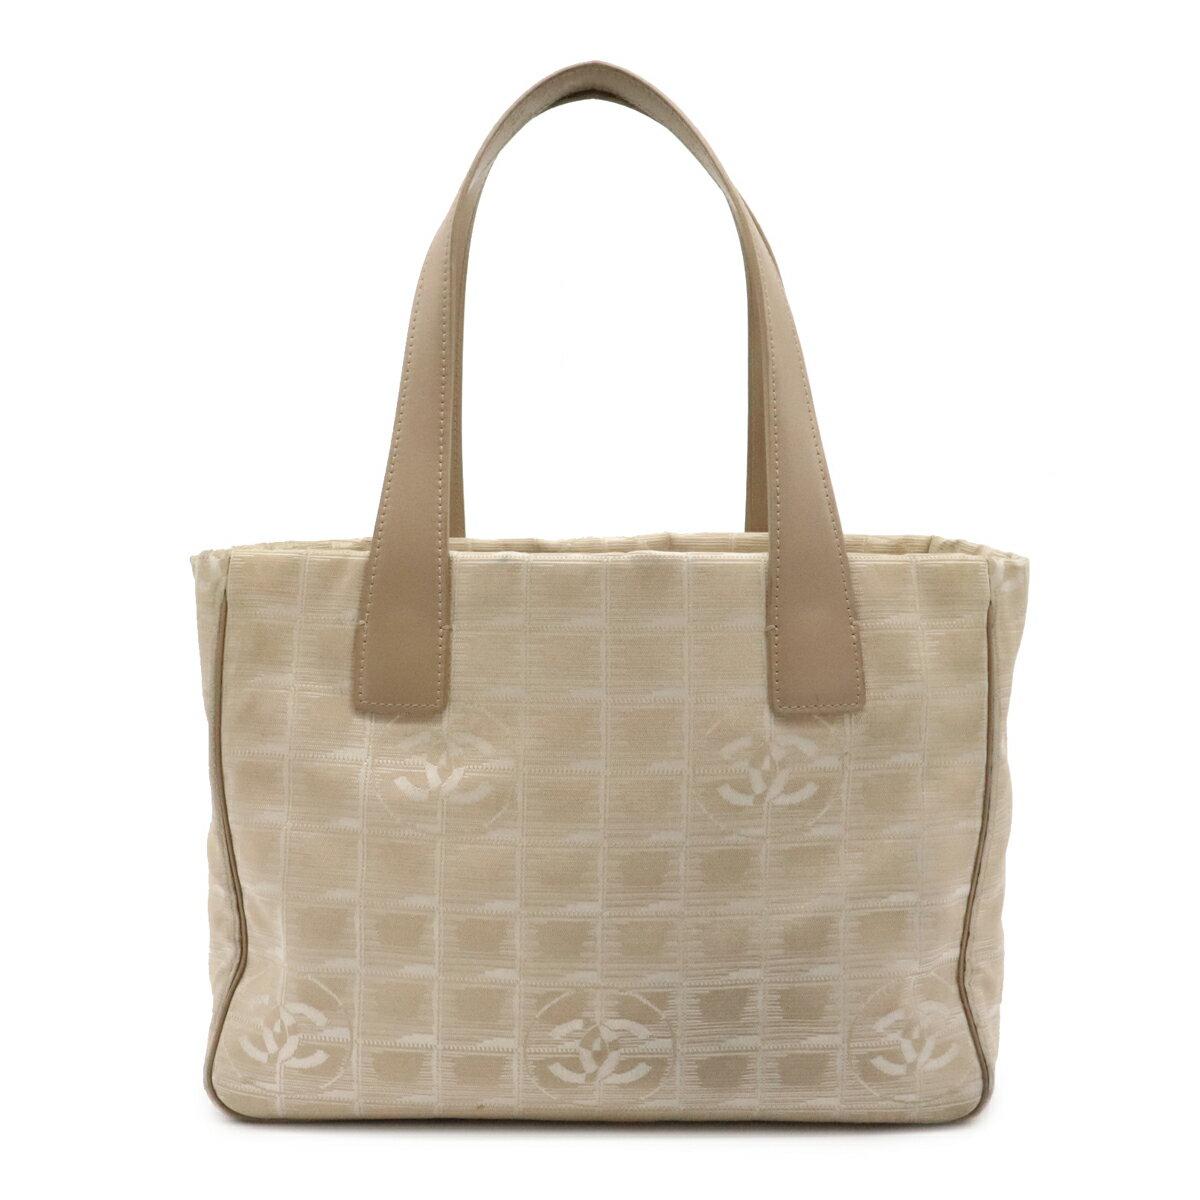 CHANEL nylon bag CHANEL New PM A20457